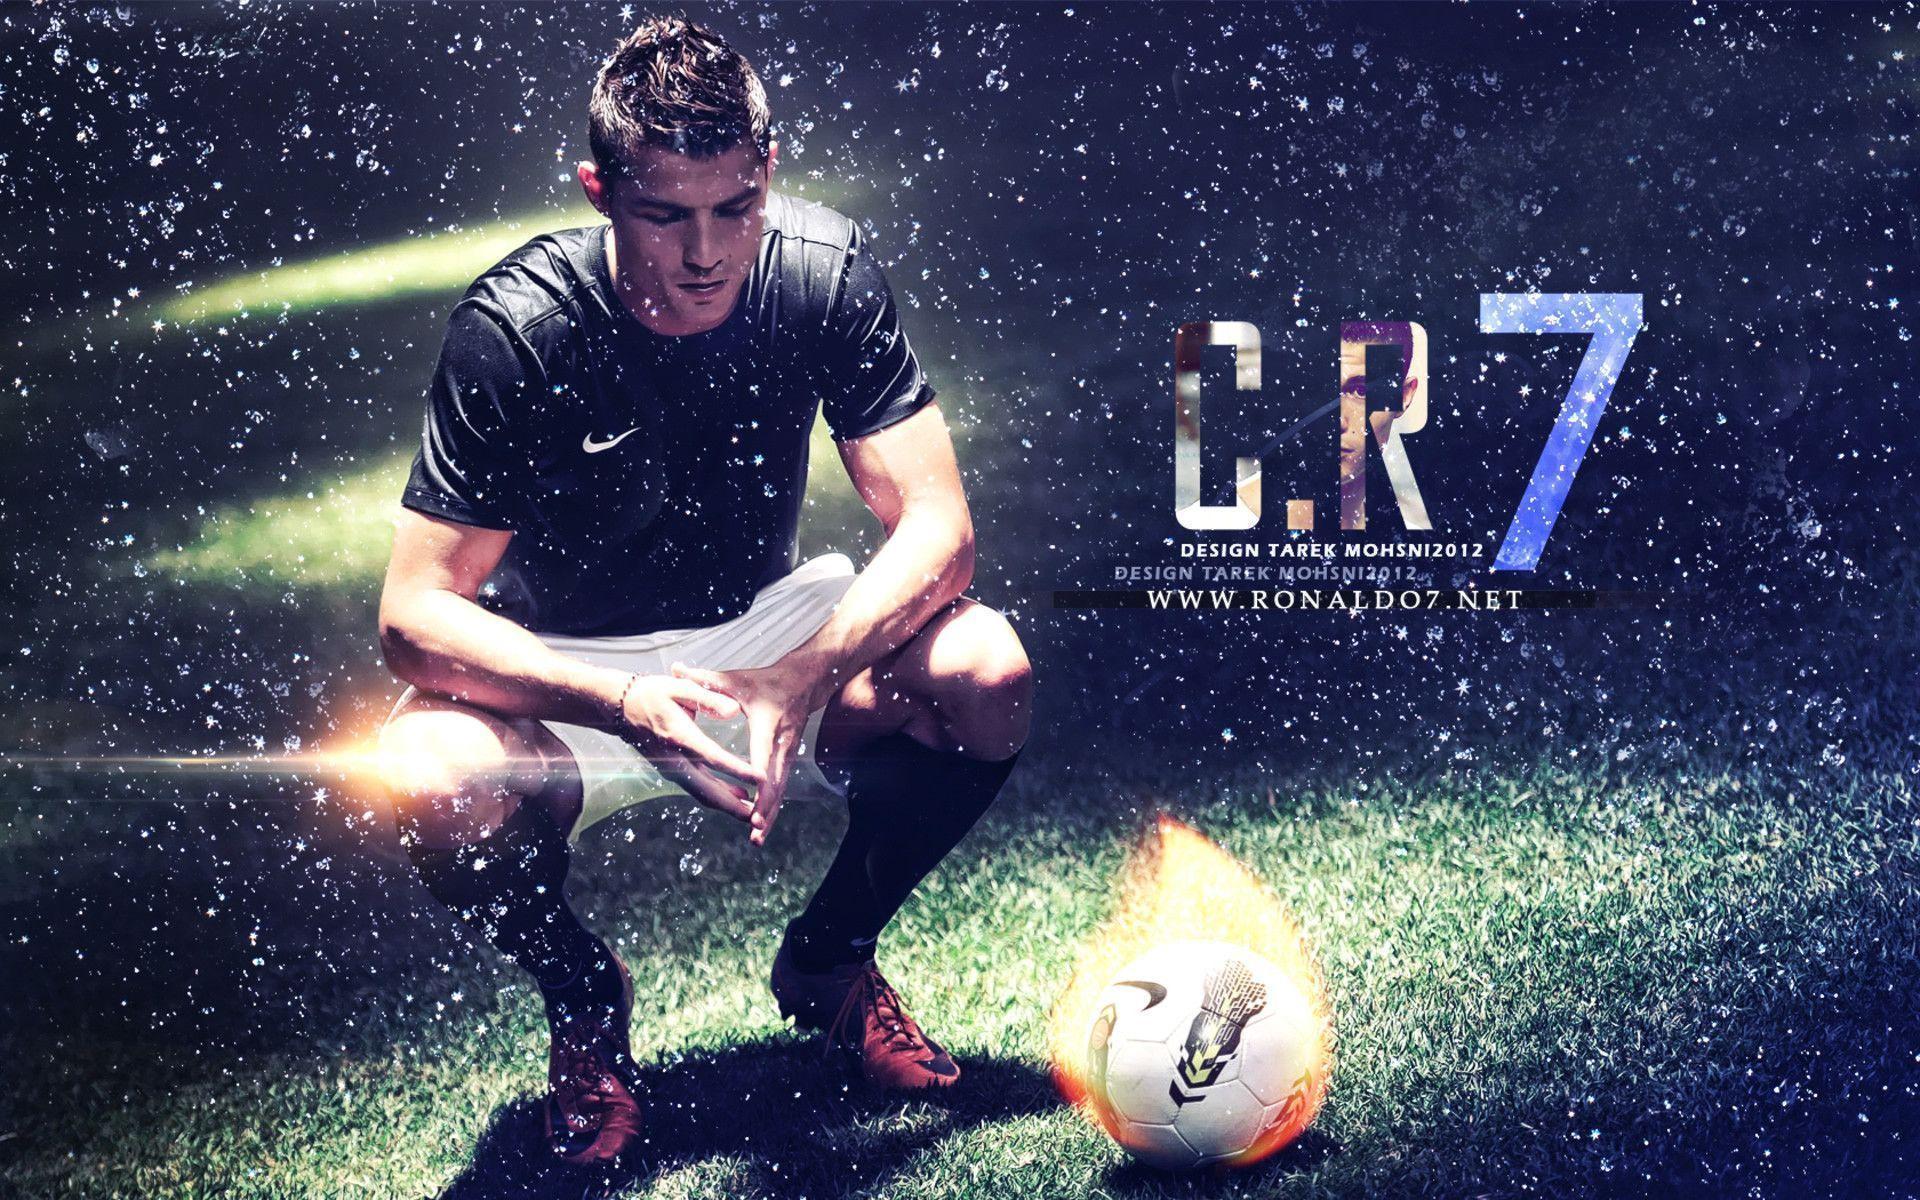 Jugar con satélite encima  CR7 Nike Wallpapers - Top Free CR7 Nike Backgrounds - WallpaperAccess